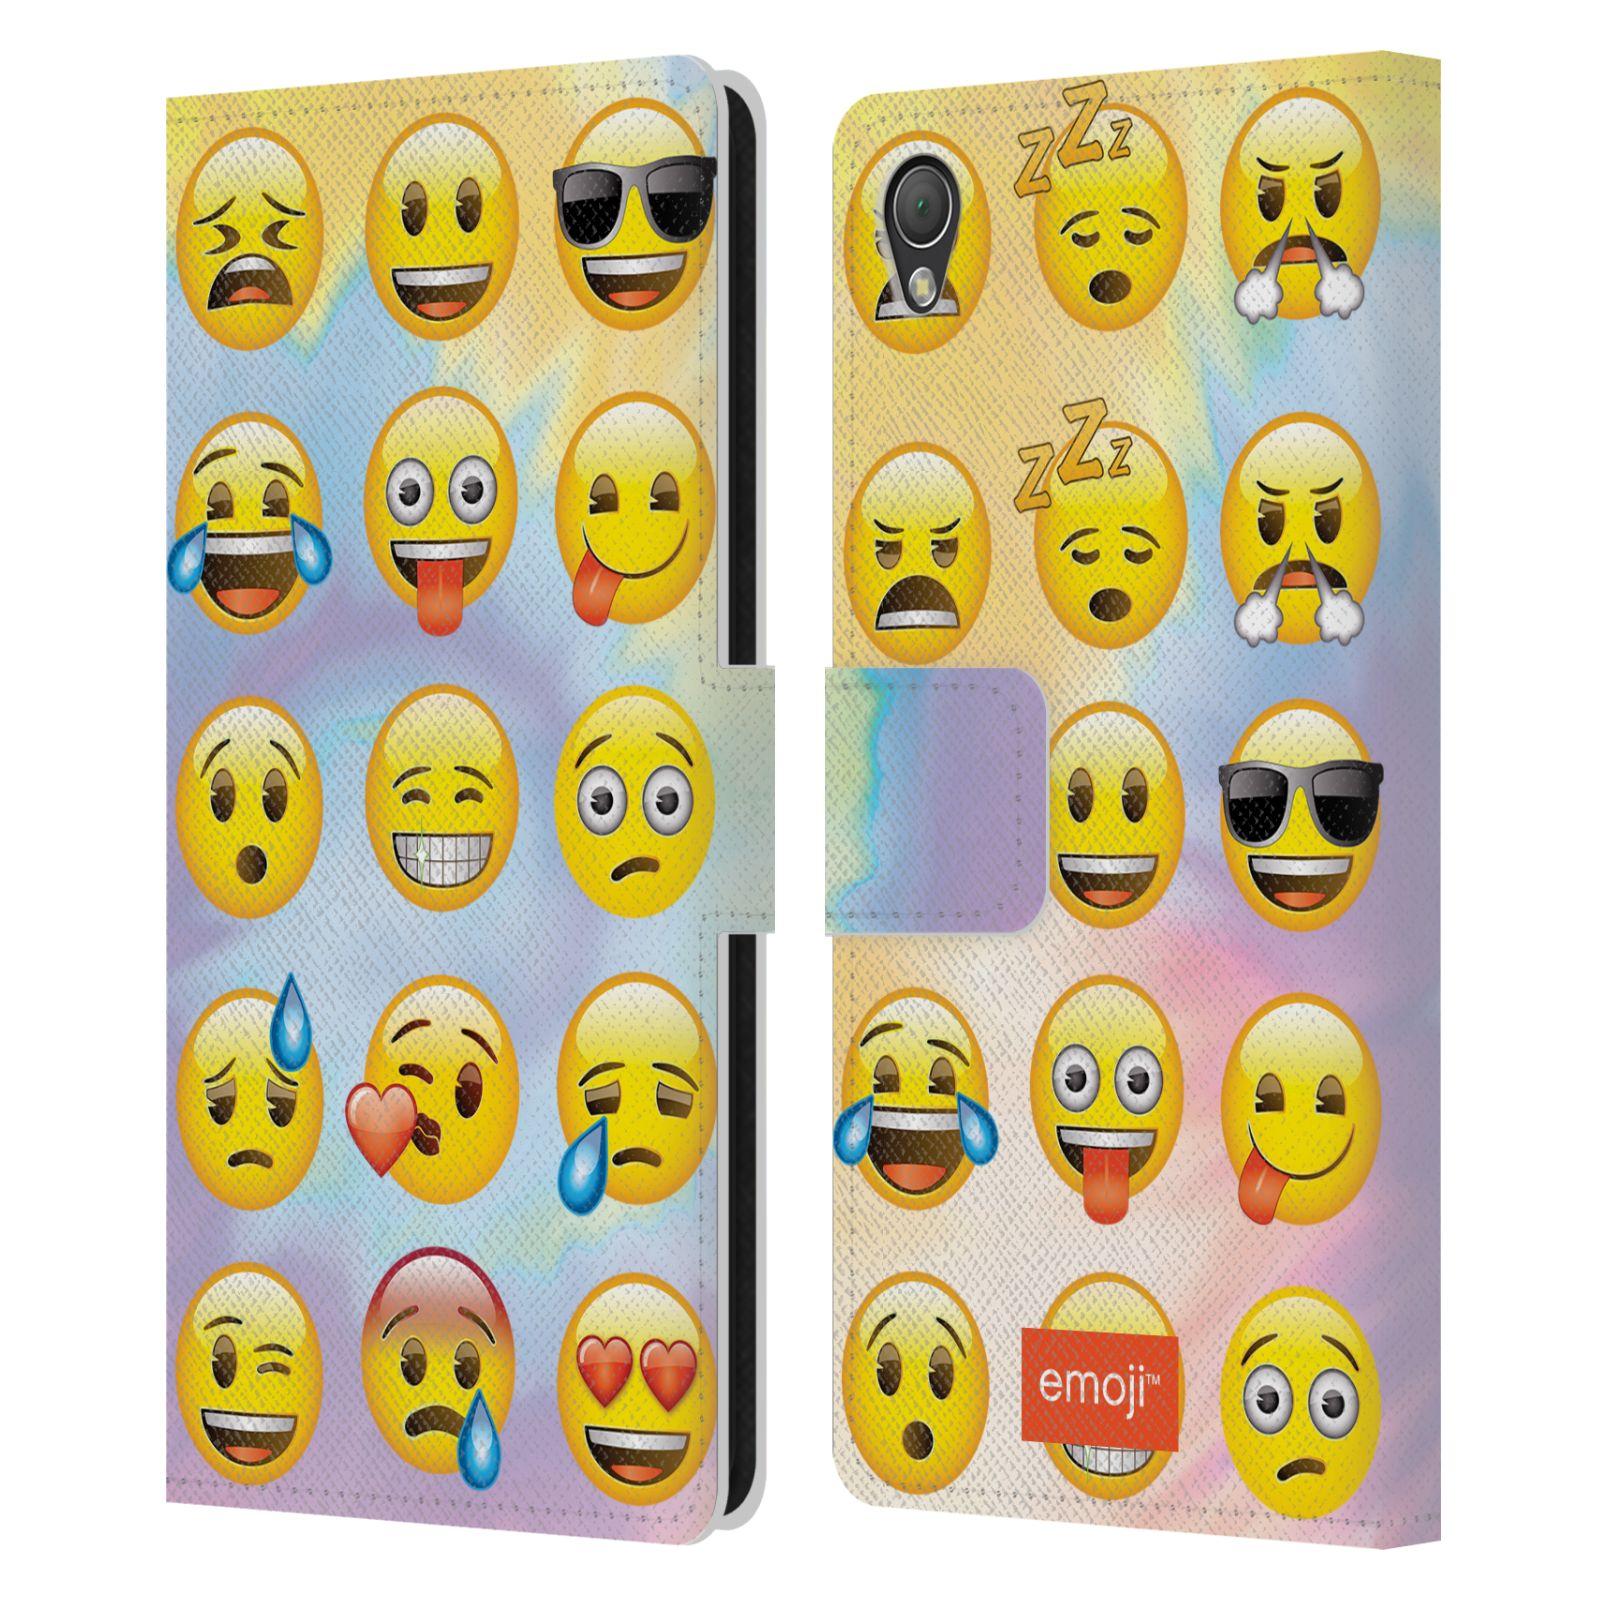 Diy Emoji Book Cover : Official emoji smileys leather book wallet case cover for